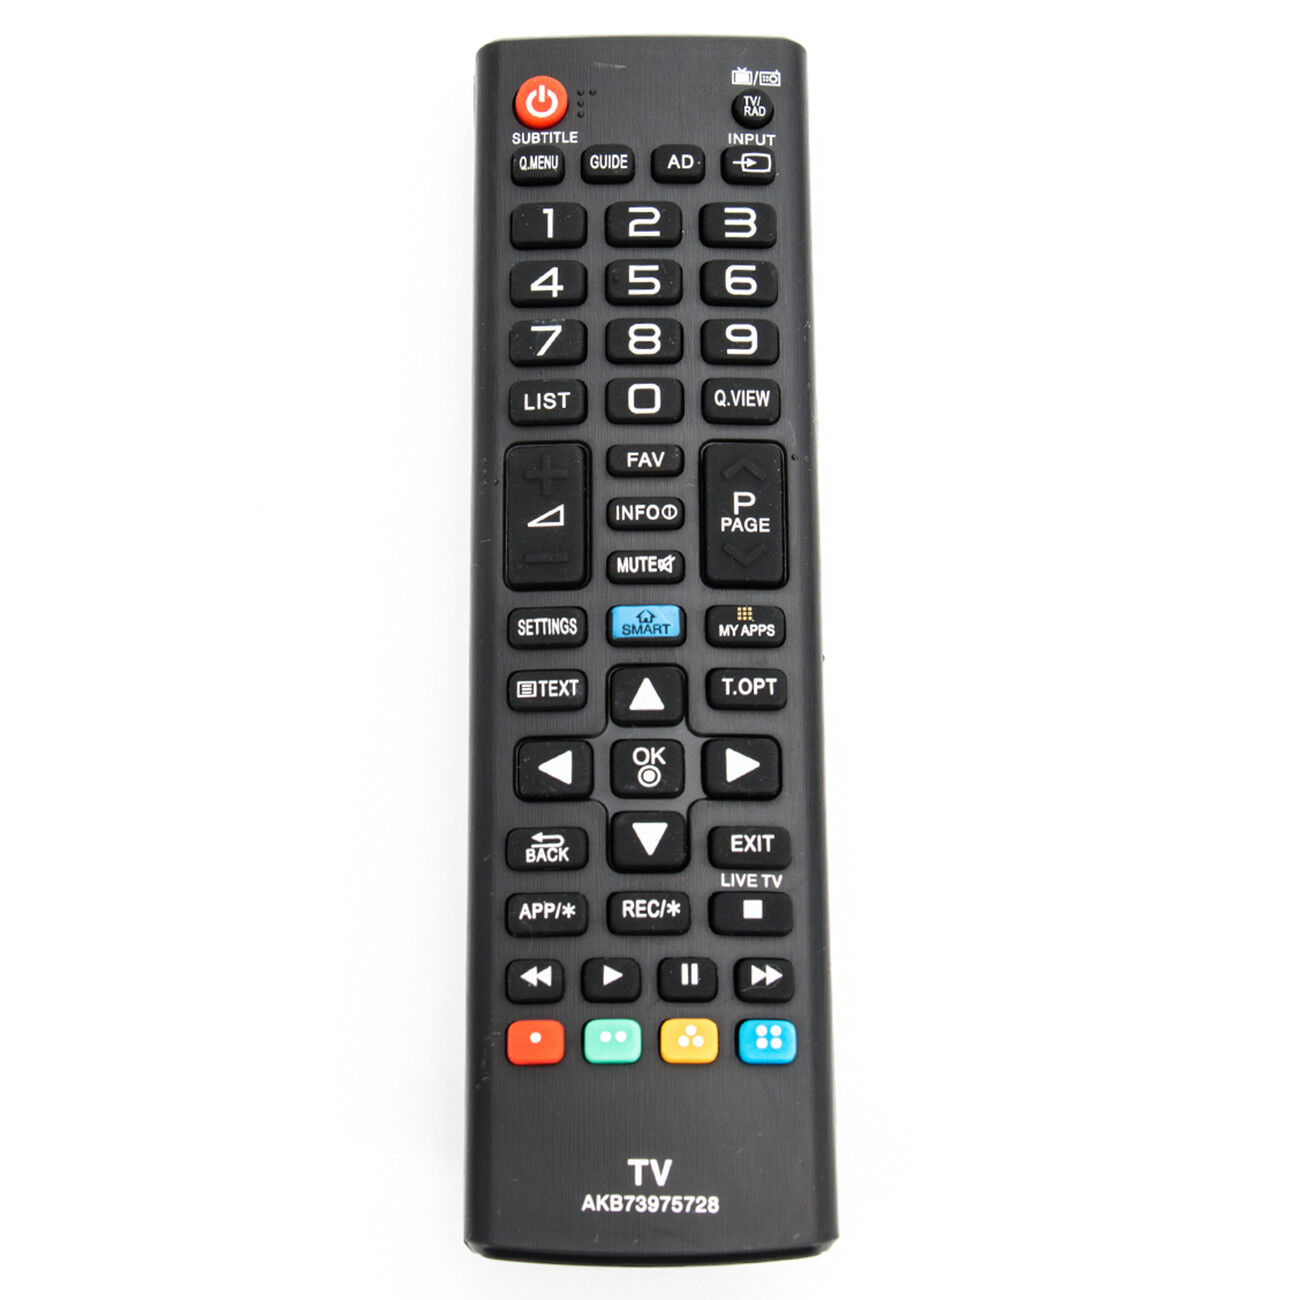 Nuovo telecomando sostituito AKB73975728 per LG TV 32LB585V 32LB580V 42LB580V